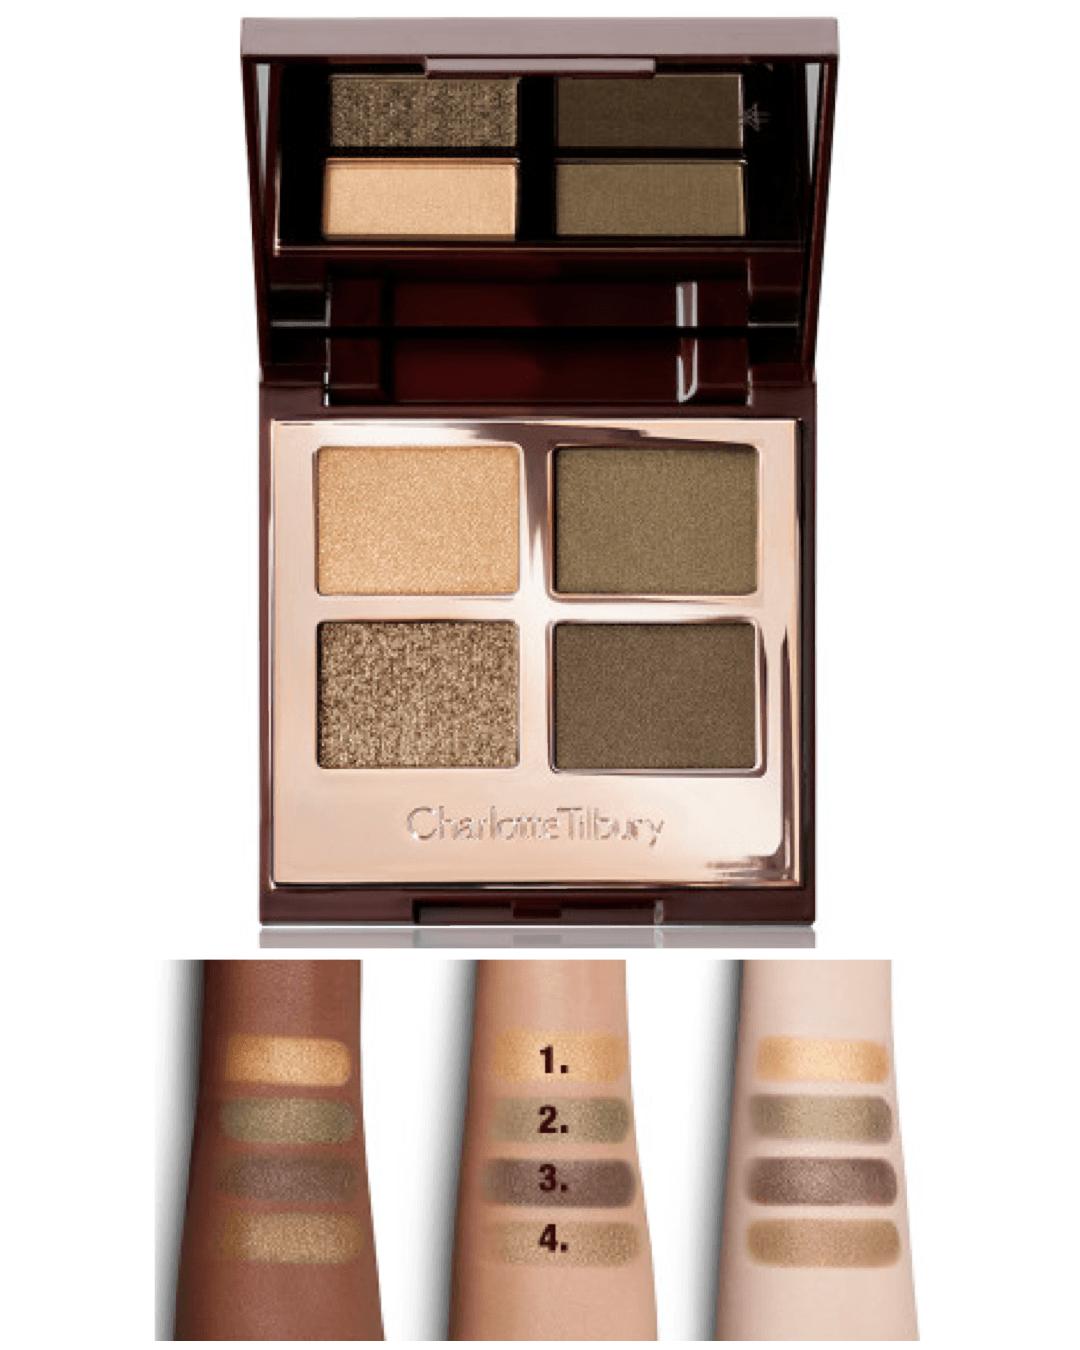 Charlotte Tilbury Luxury Palette - 4 NEW PALETTES!